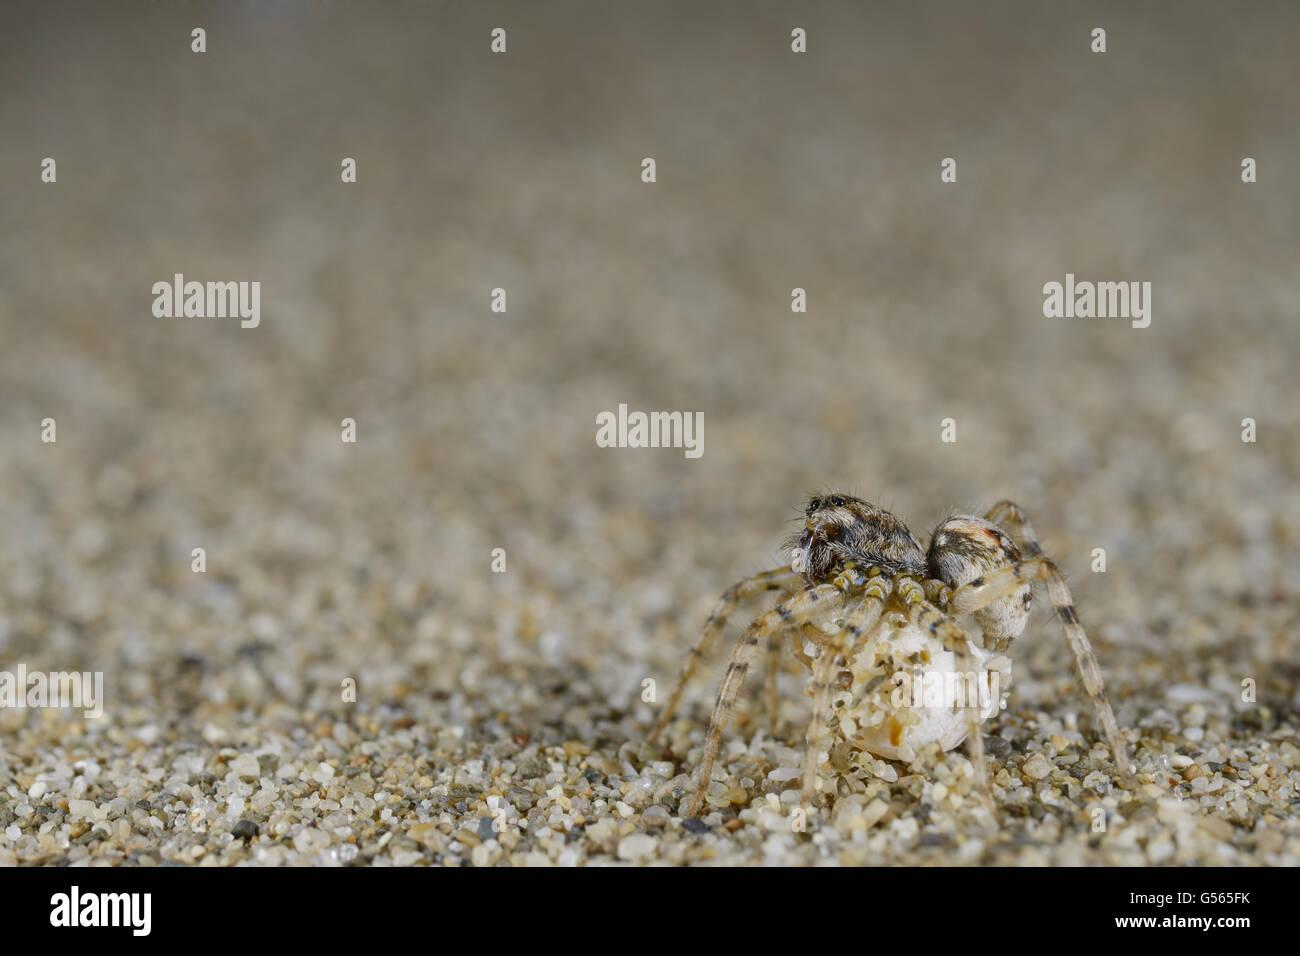 Sand Wolfspider (Arctosa perita) adult female, with ovisac, on sandy seashore, Italy, April - Stock Image